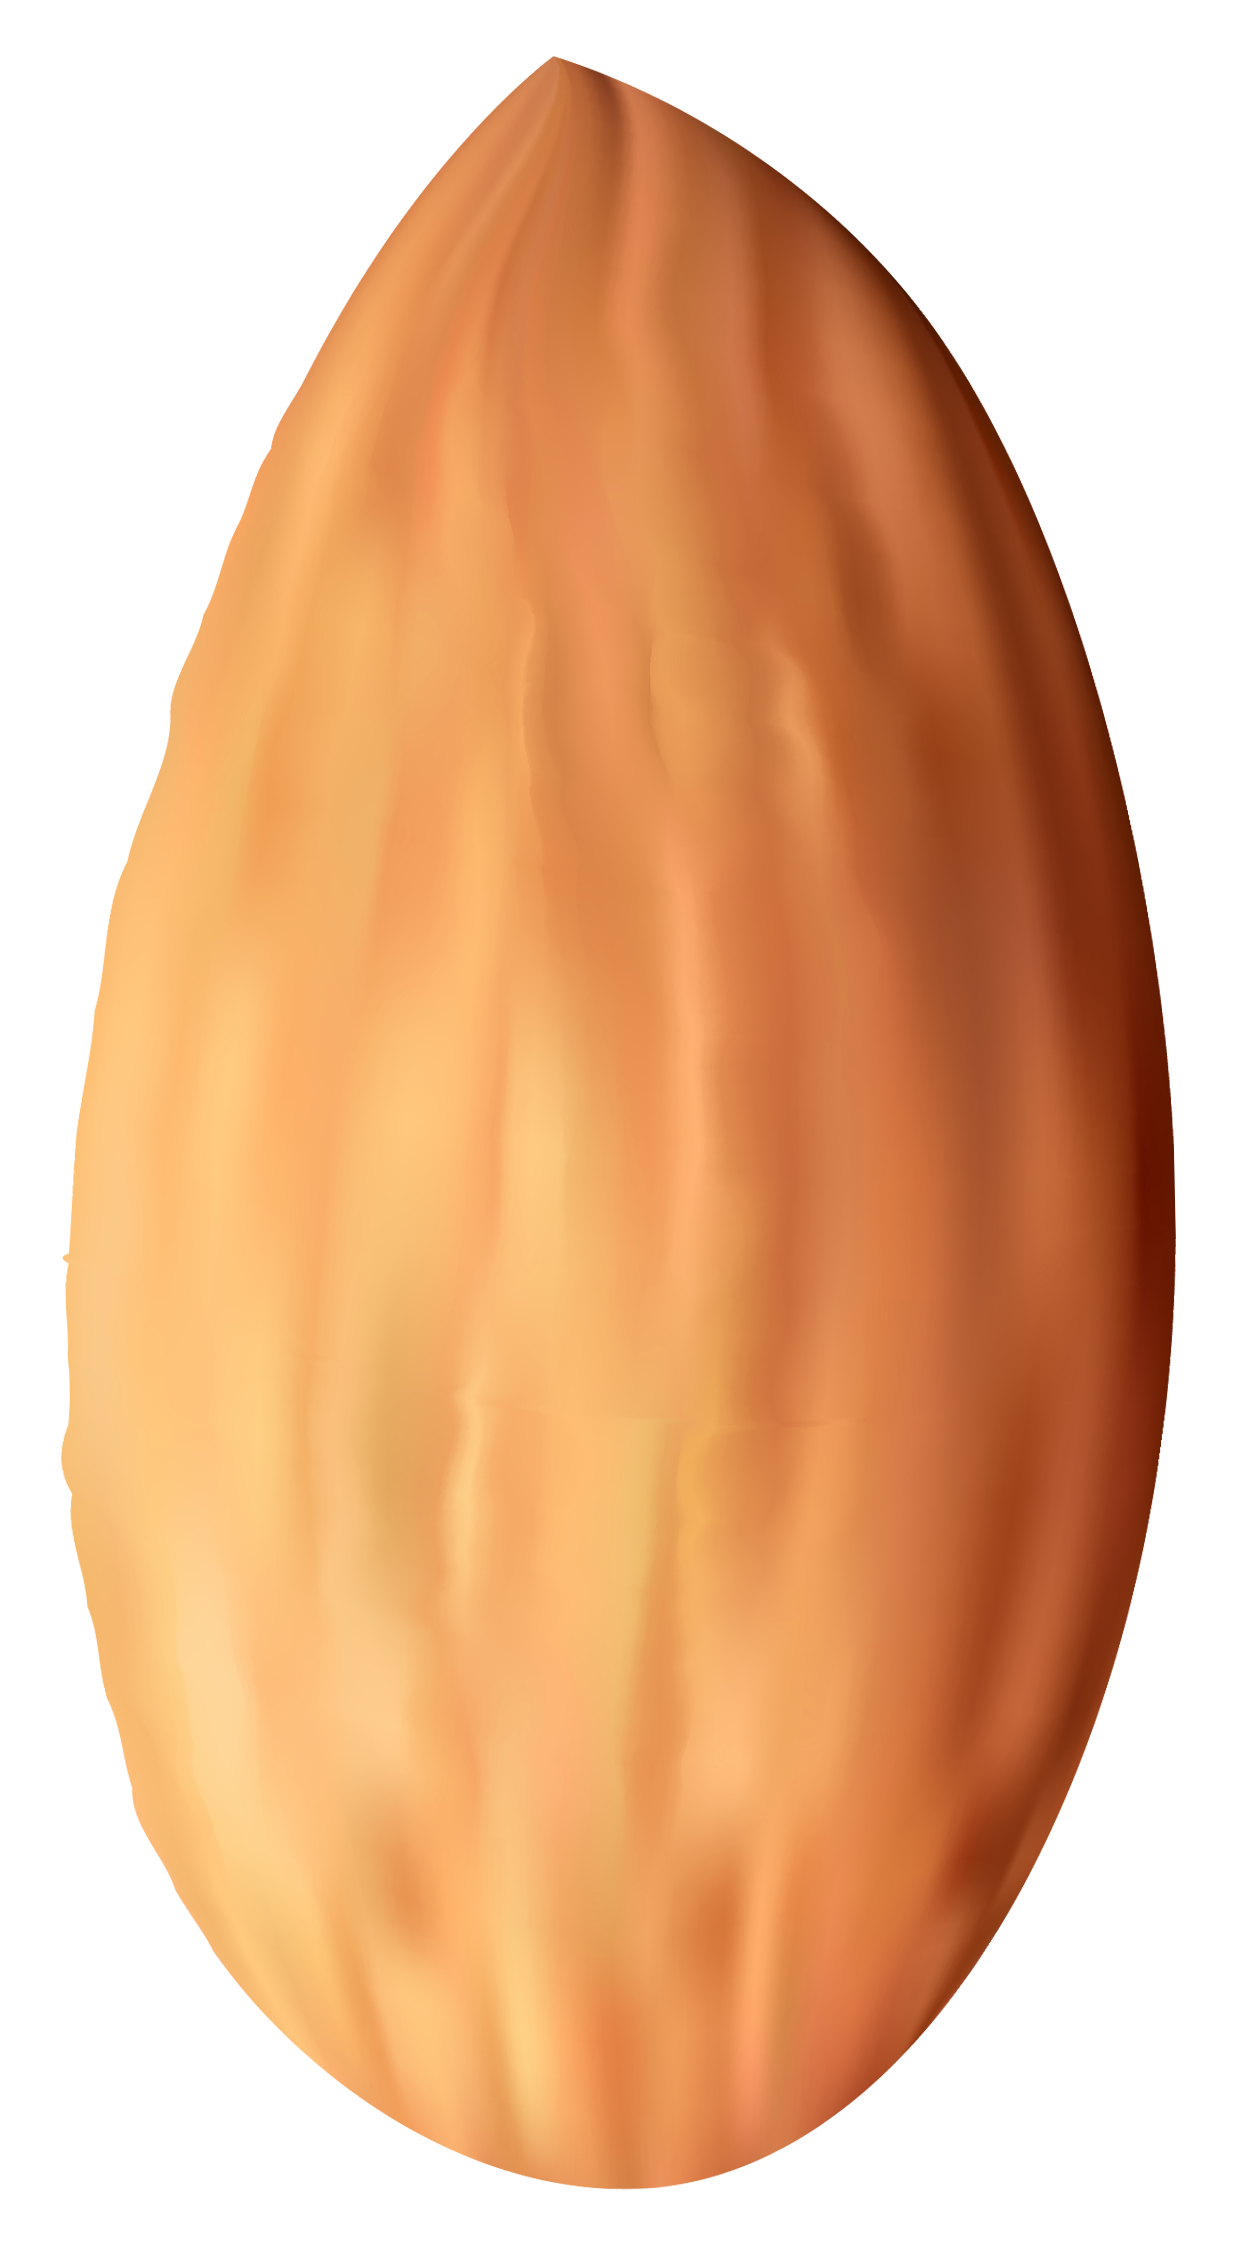 Almond nut png best. Clipart eyes orange